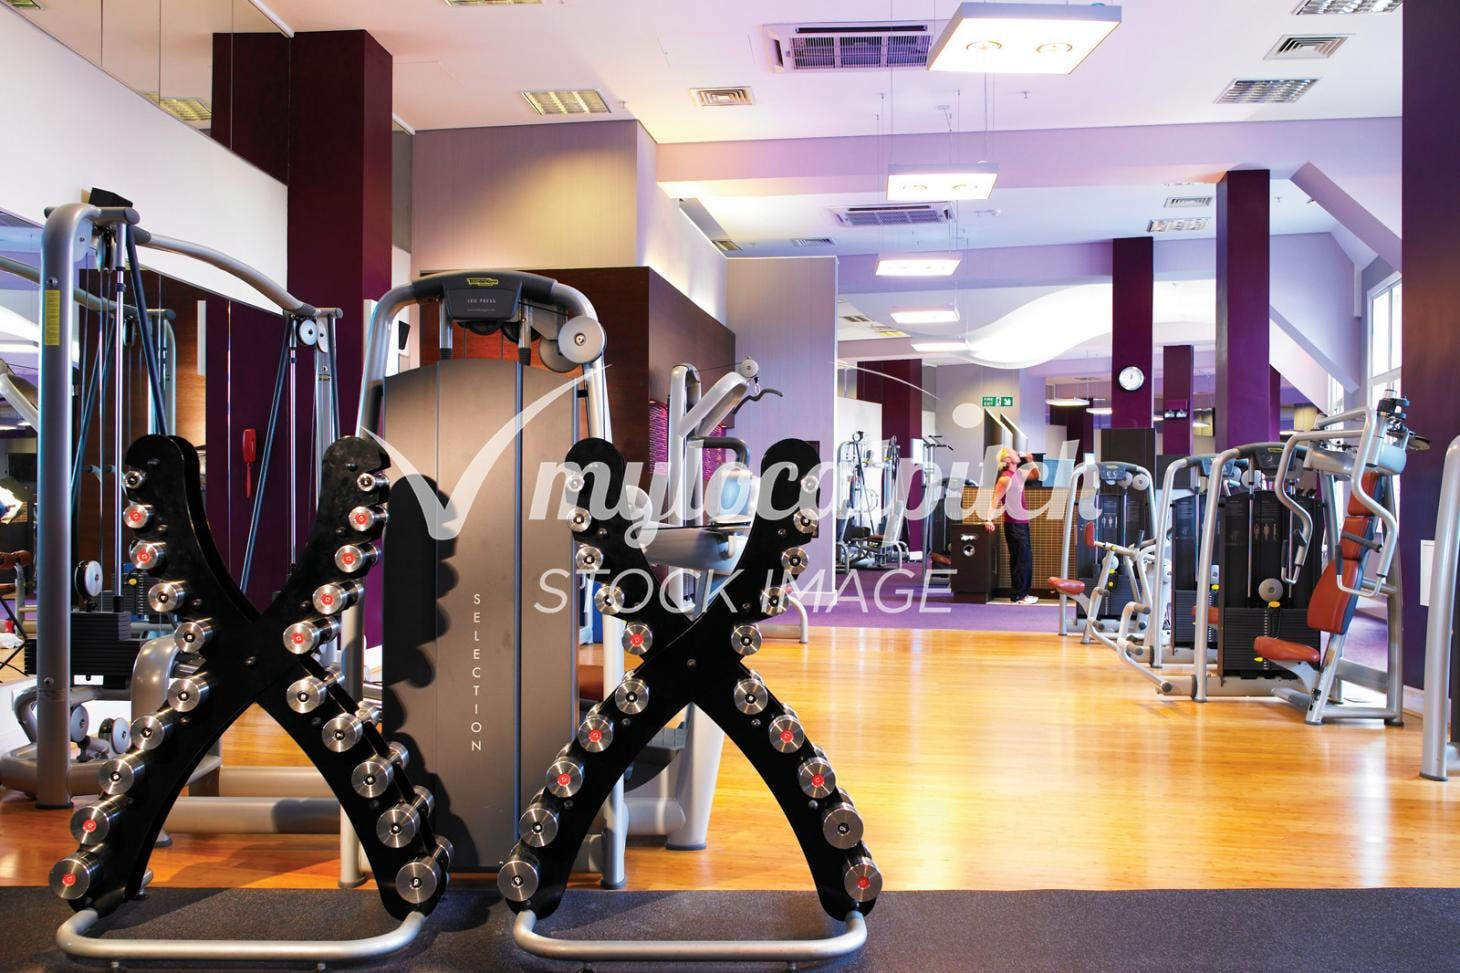 Ealing Squash and Fitness Gym gym